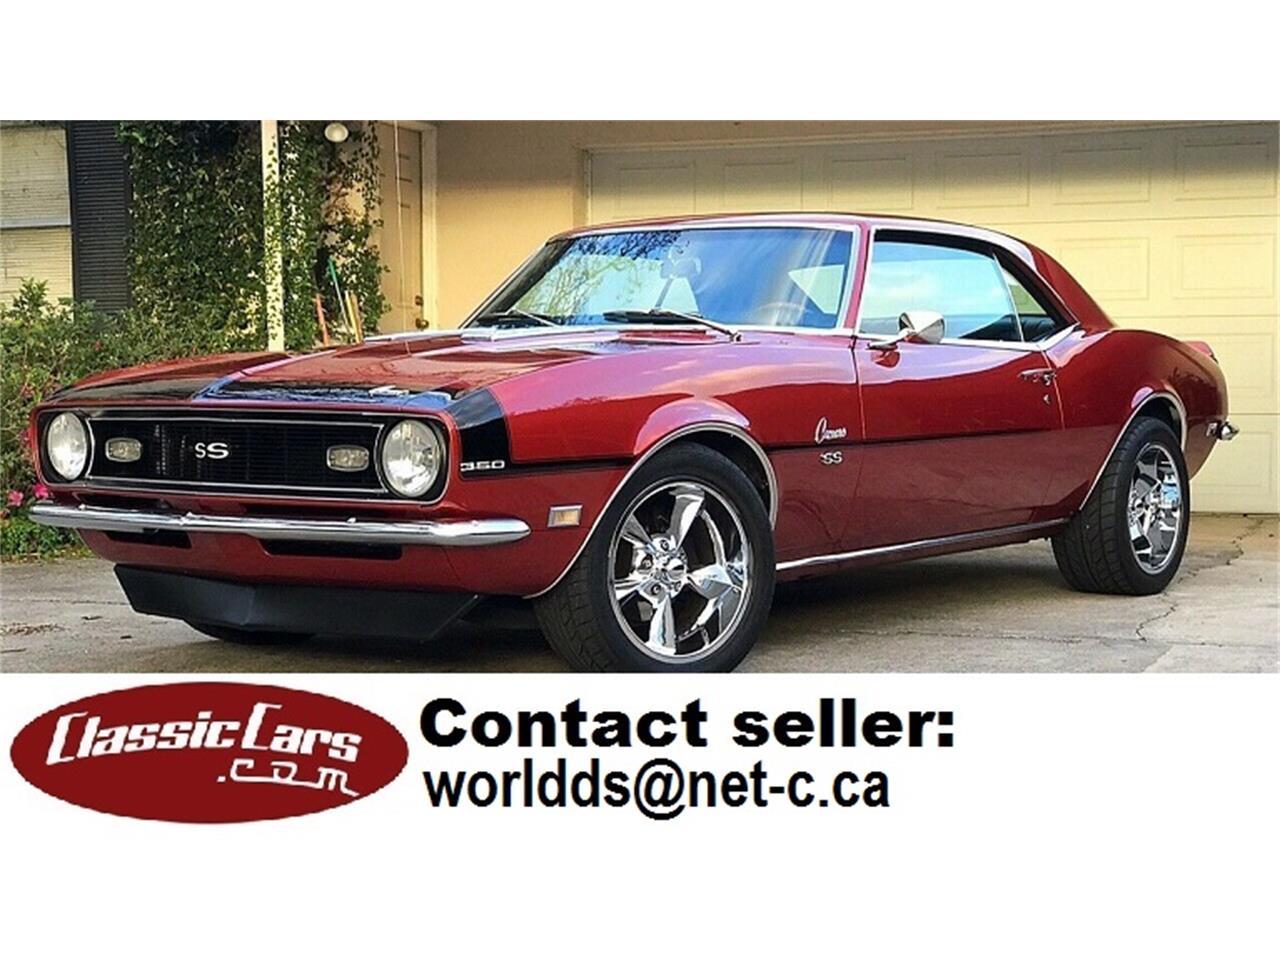 for sale 1968 chevrolet camaro in los angeles, california cars - los angeles, ca at geebo